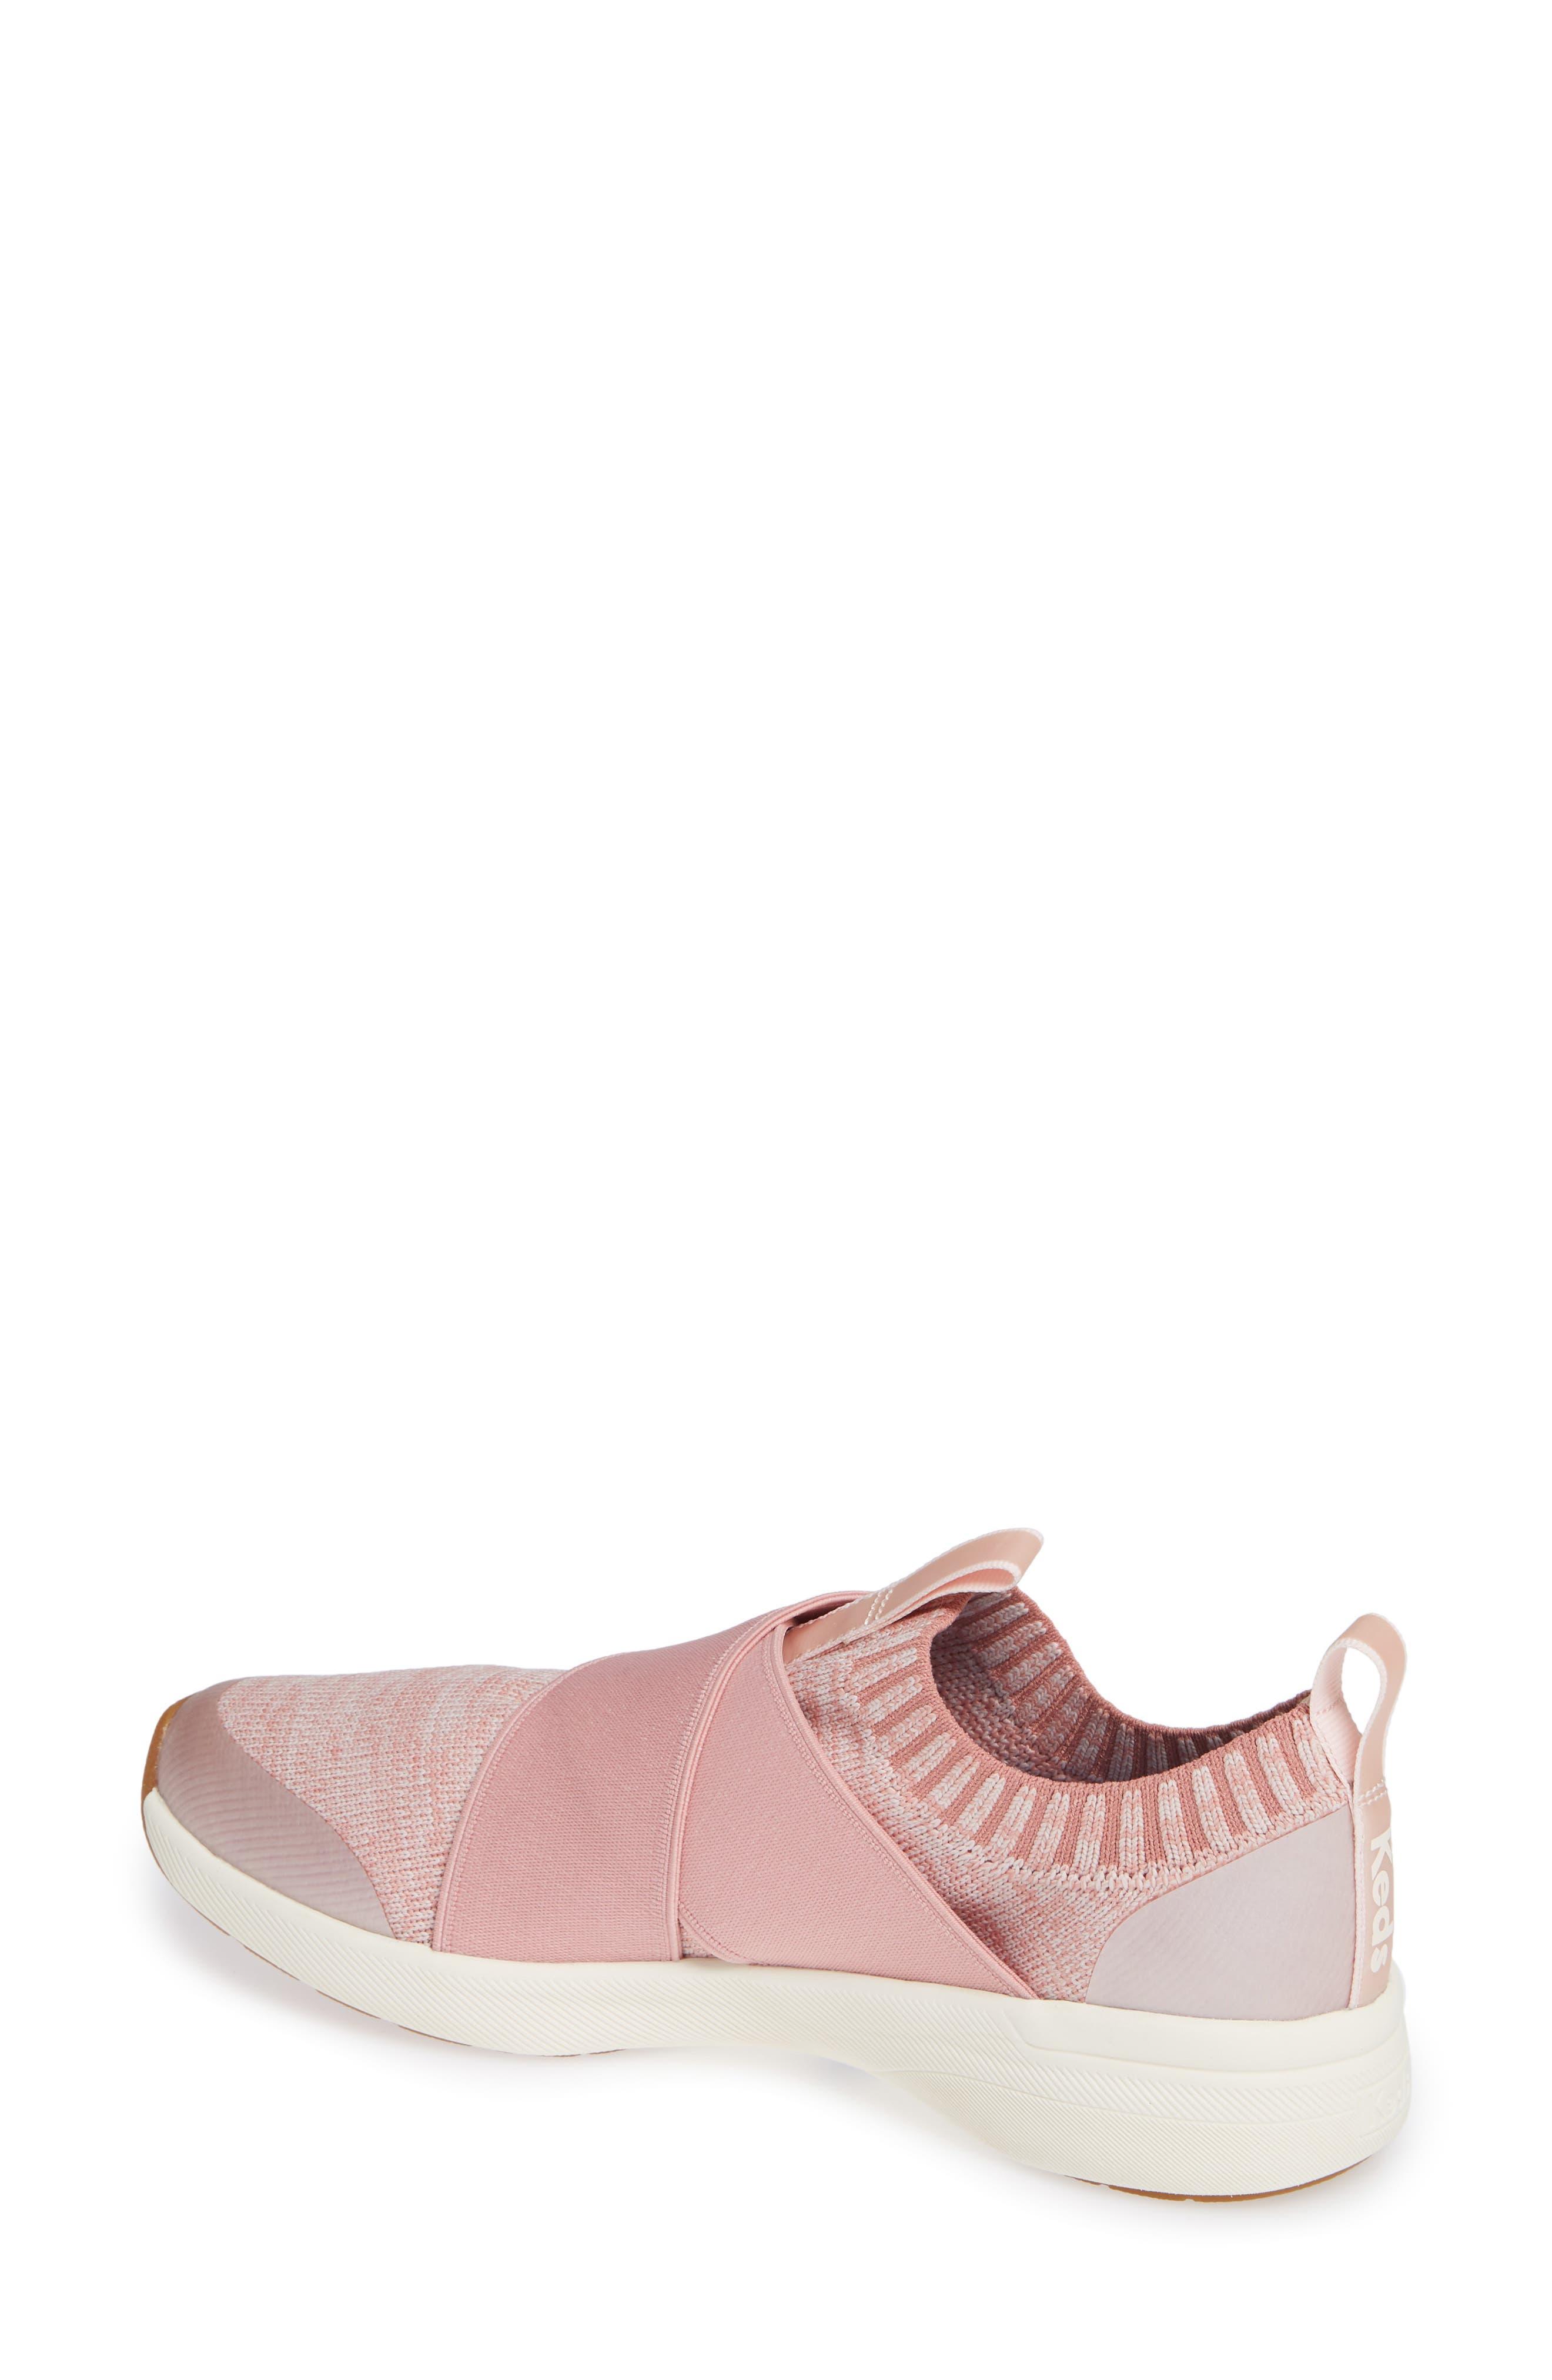 KEDS<SUP>®</SUP>,                             Studio Jumper Knit Sneaker,                             Alternate thumbnail 2, color,                             LIGHT PINK